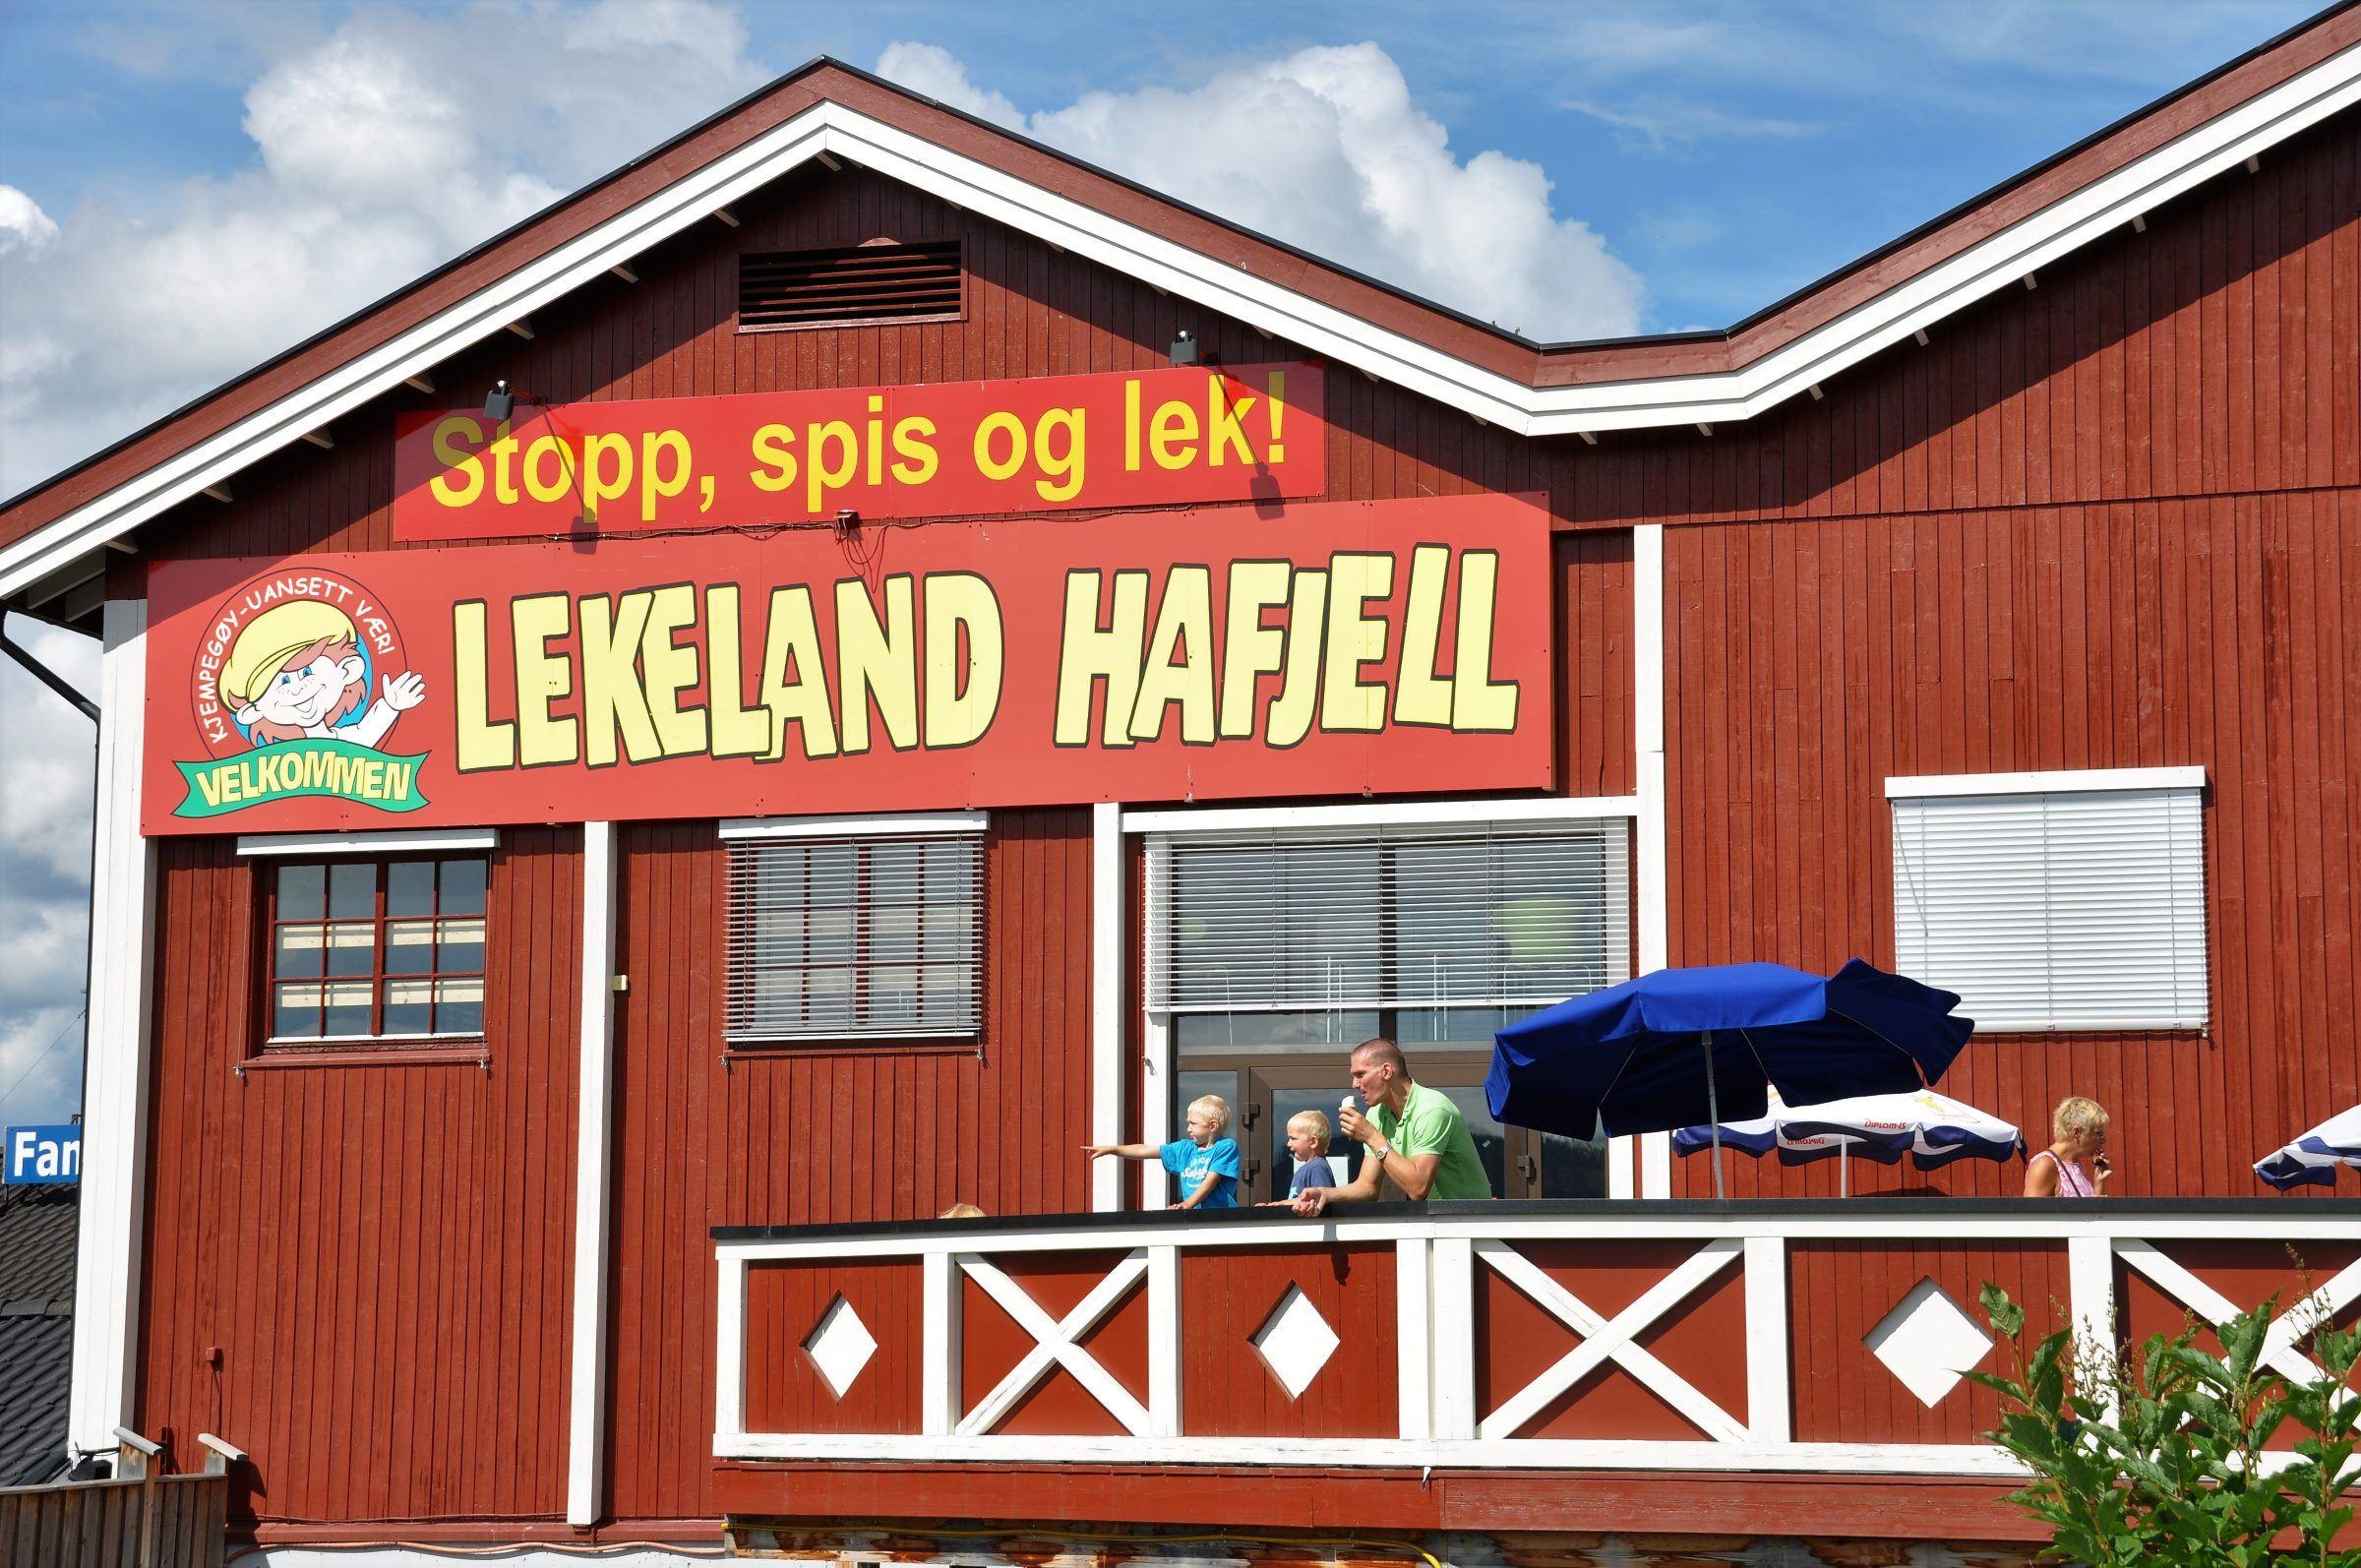 Playland Hafjell